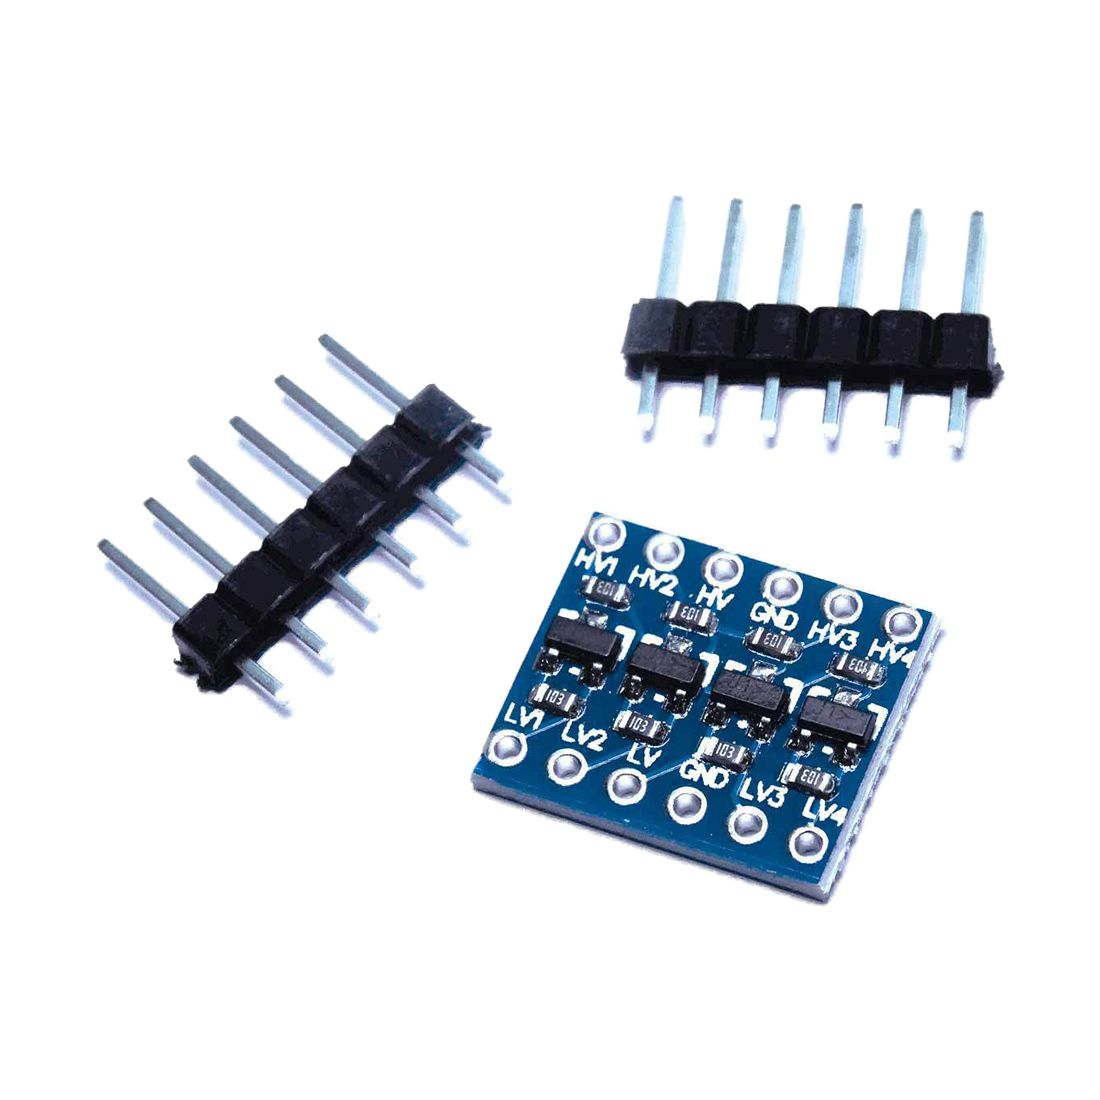 5x level converter 4 channel 5V - 3.3V Level Shifter bidirectional For I2C Arduino Raspb5x level converter 4 channel 5V - 3.3V Level Shifter bidirectional For I2C Arduino Raspb